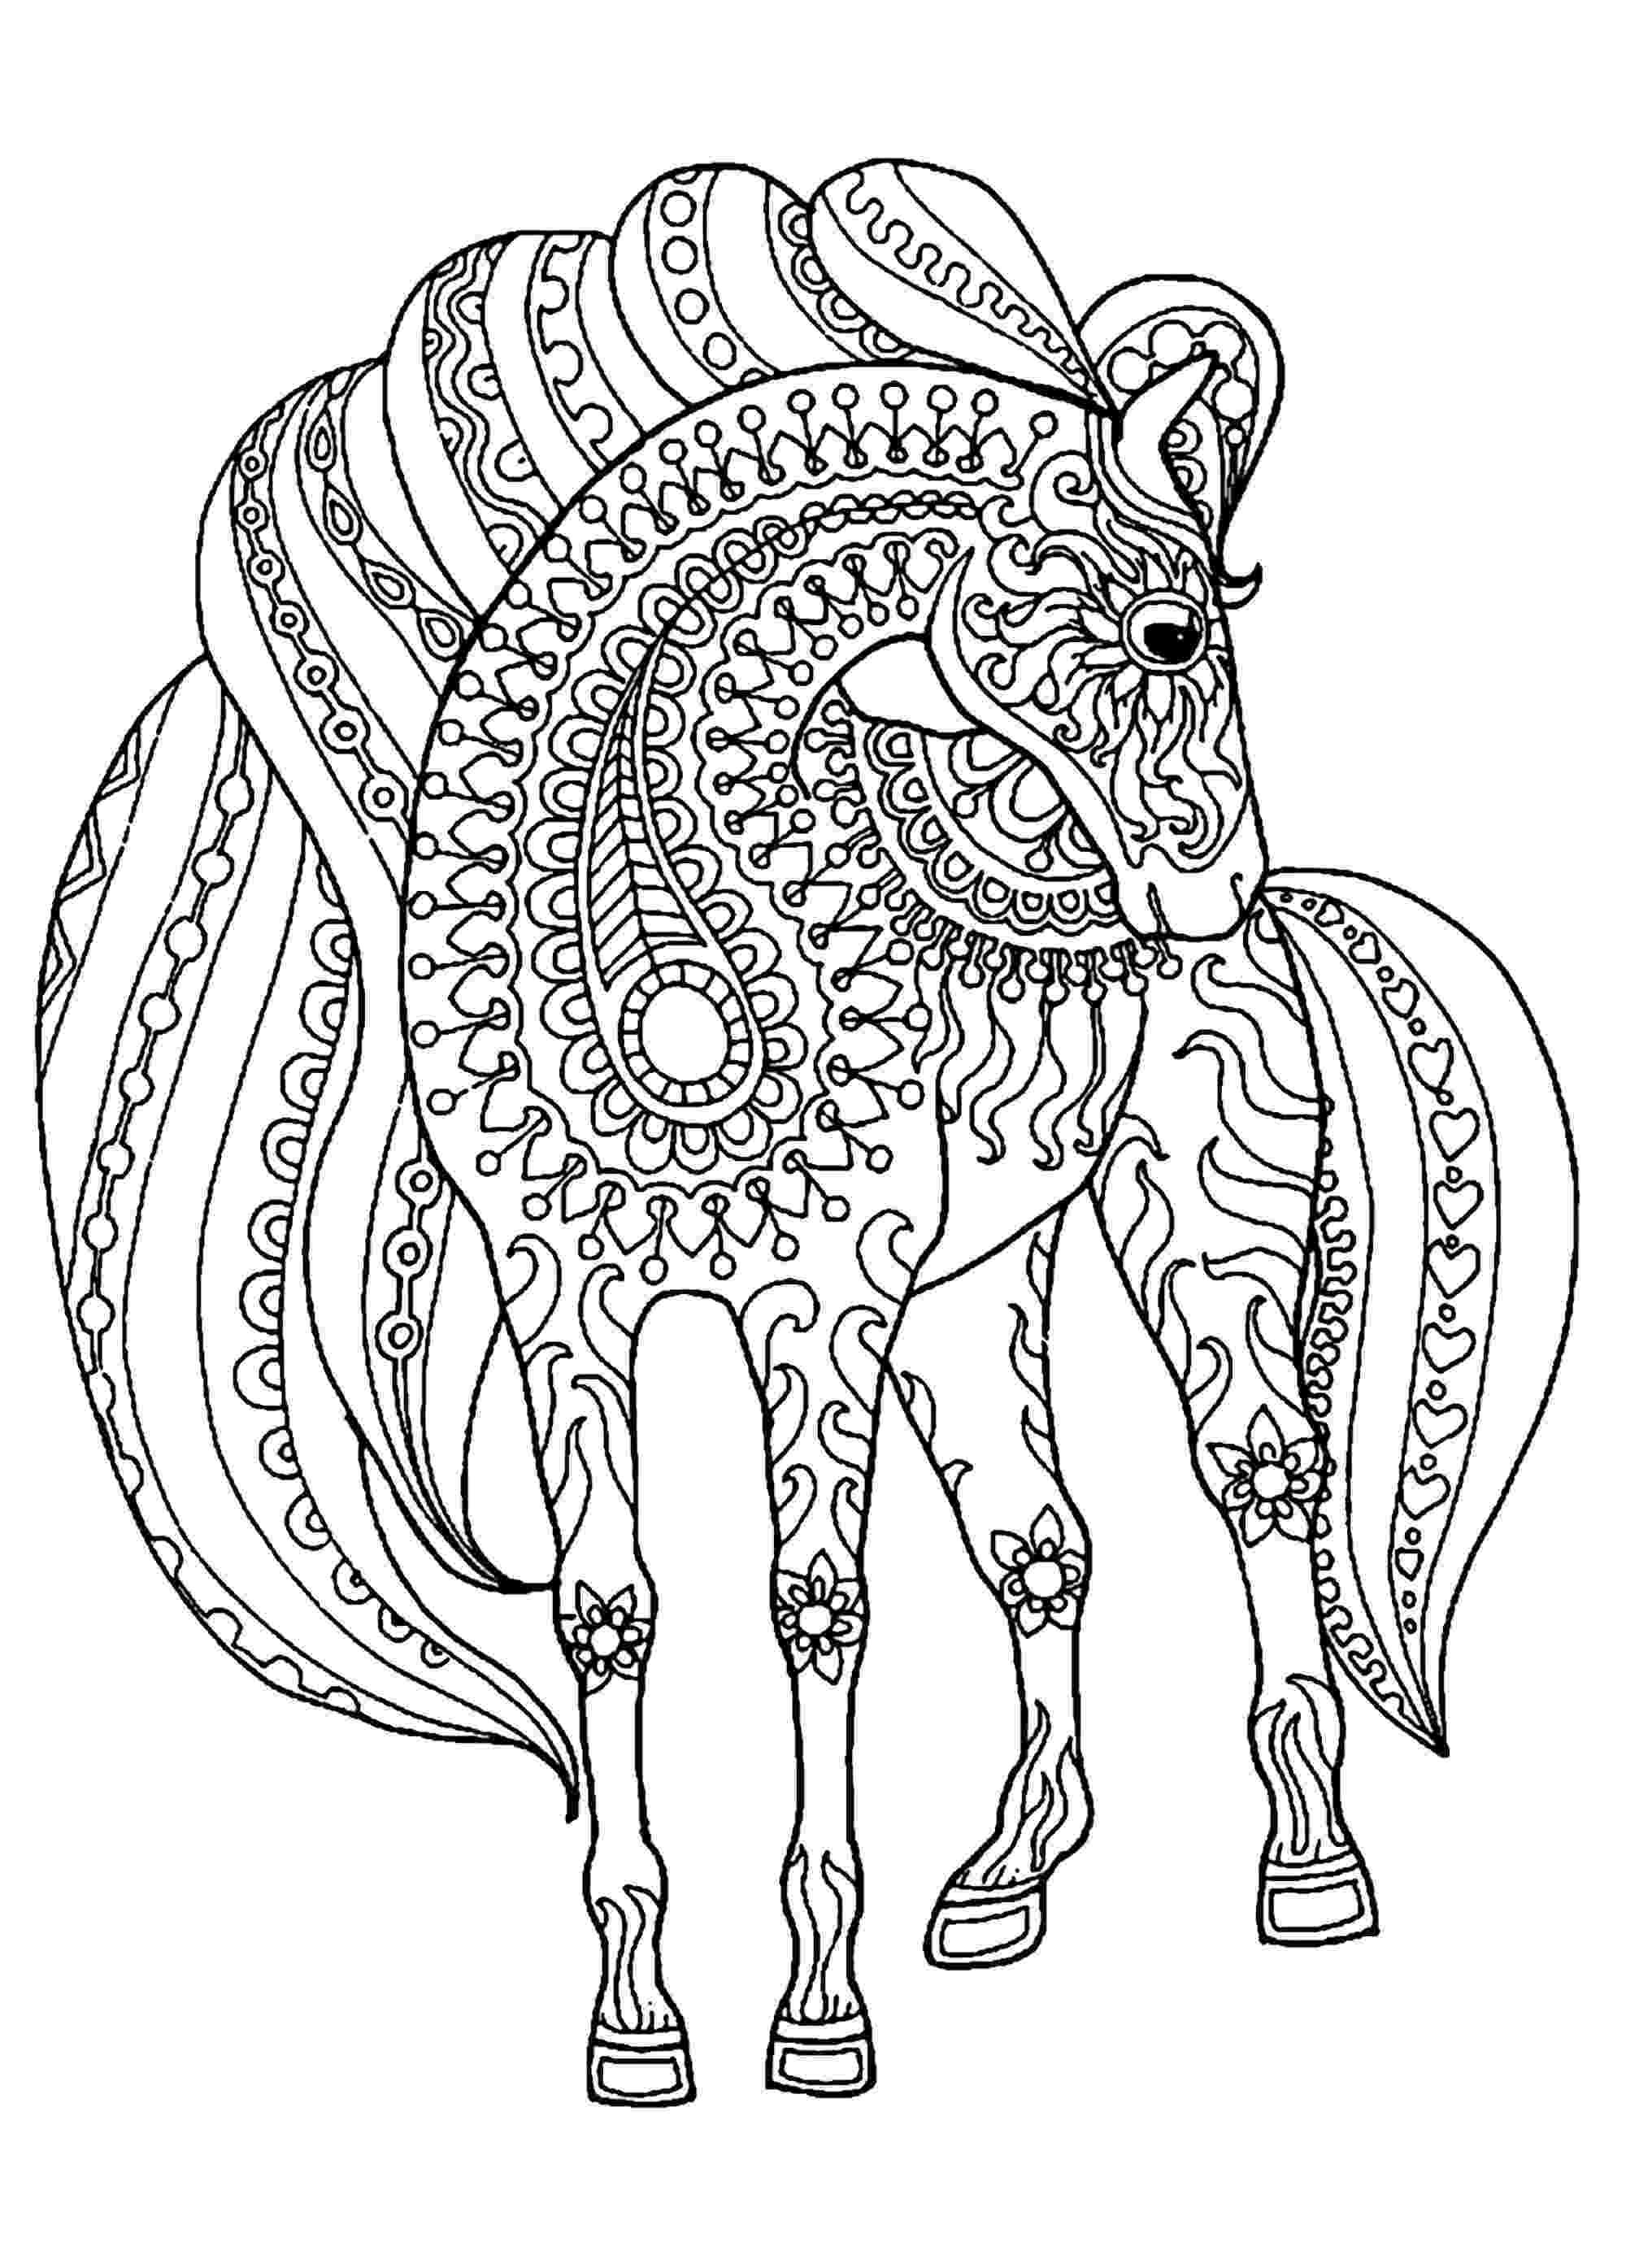 animal mandala 19 mandala animal coloring pages download coloring sheets mandala animal